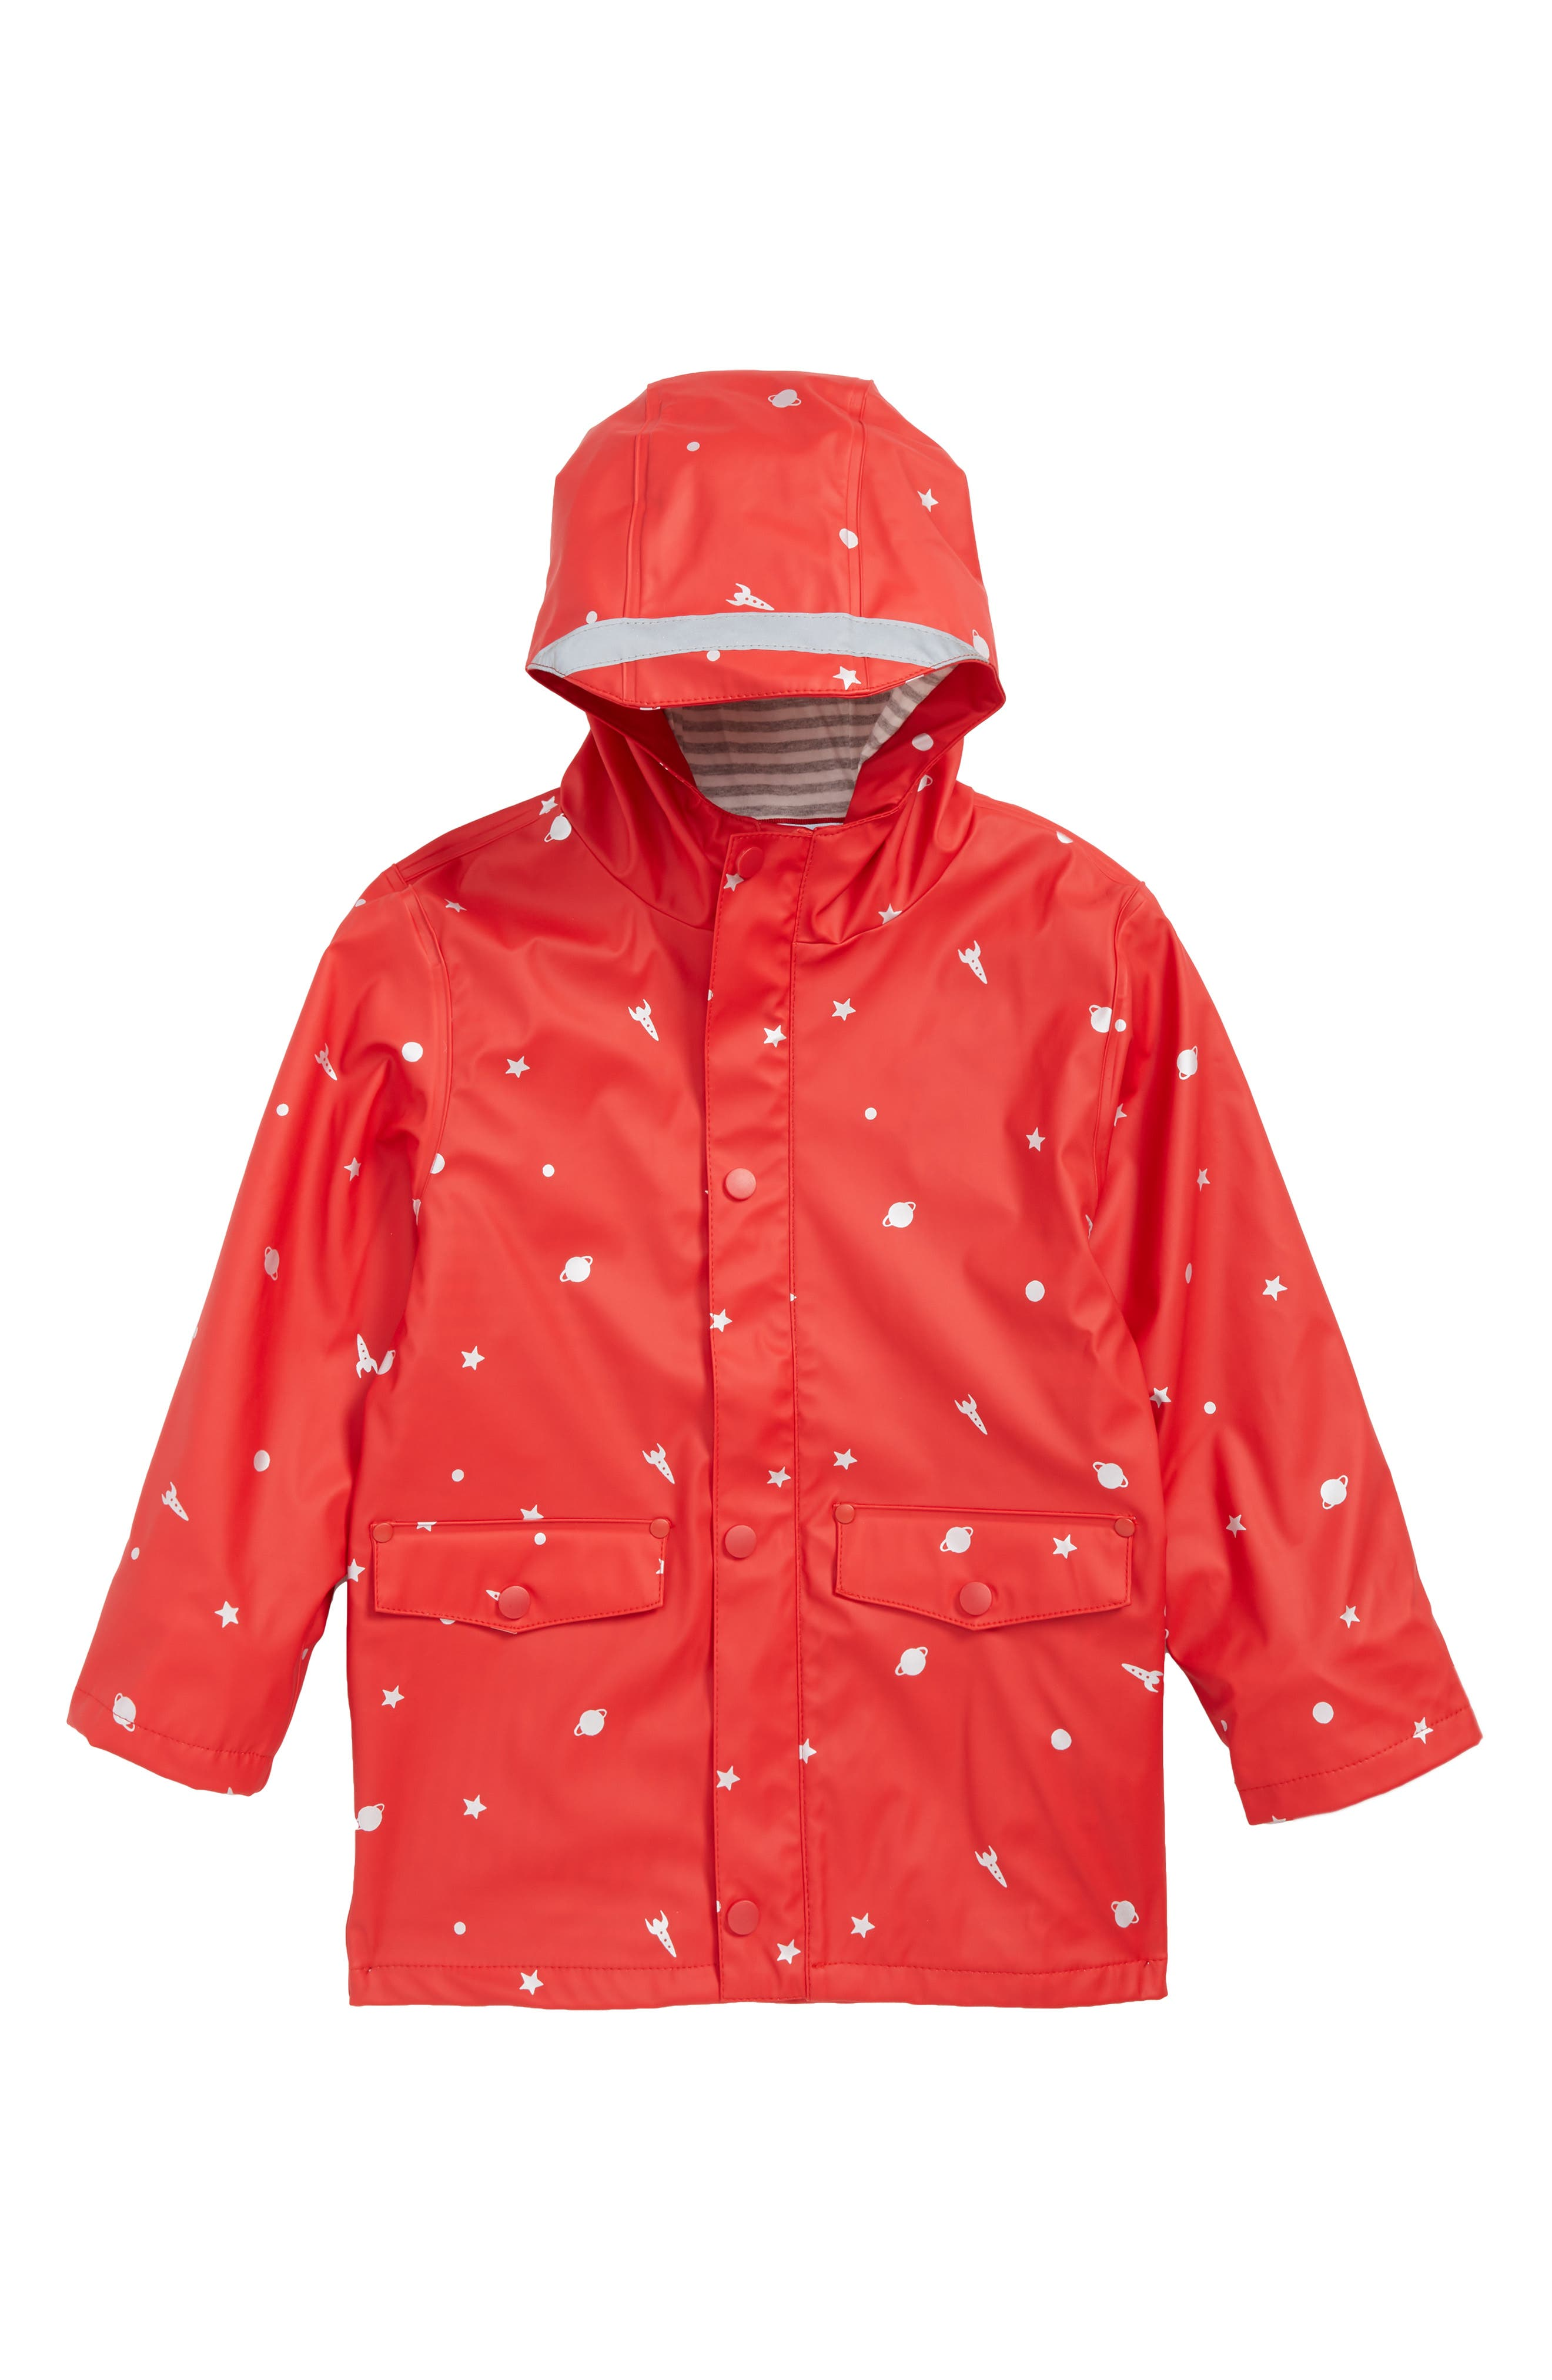 Fisherman's Waterproof Jacket,                         Main,                         color, 614